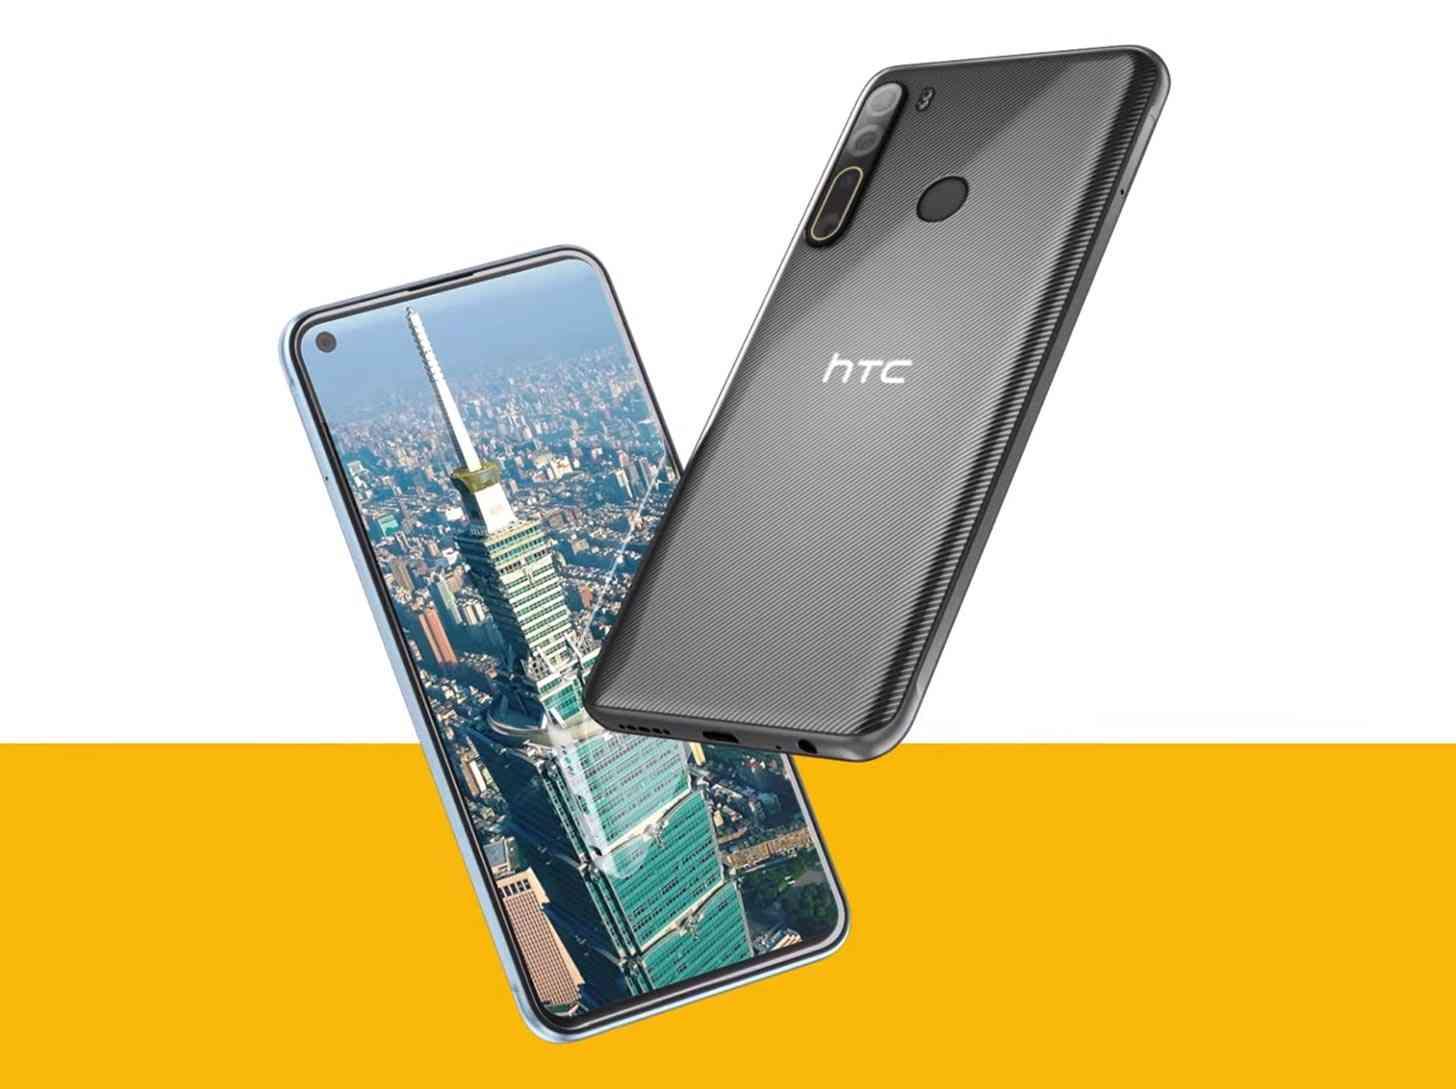 HTC Desire 20 Pro official